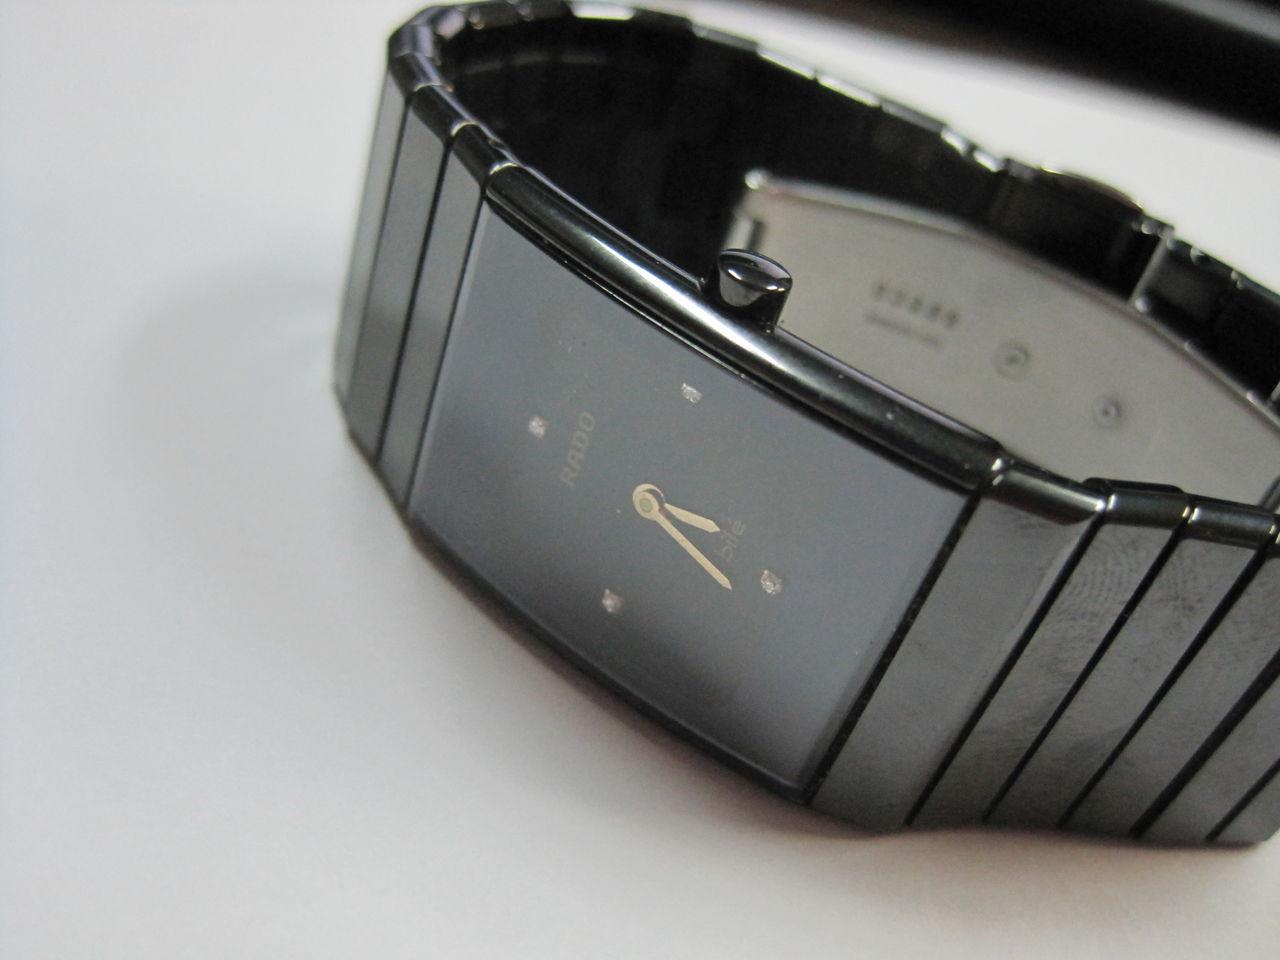 acf87622fa カテゴリ: ブランド:ラドー · 時計クリーニング. ラドー・ジュビリー